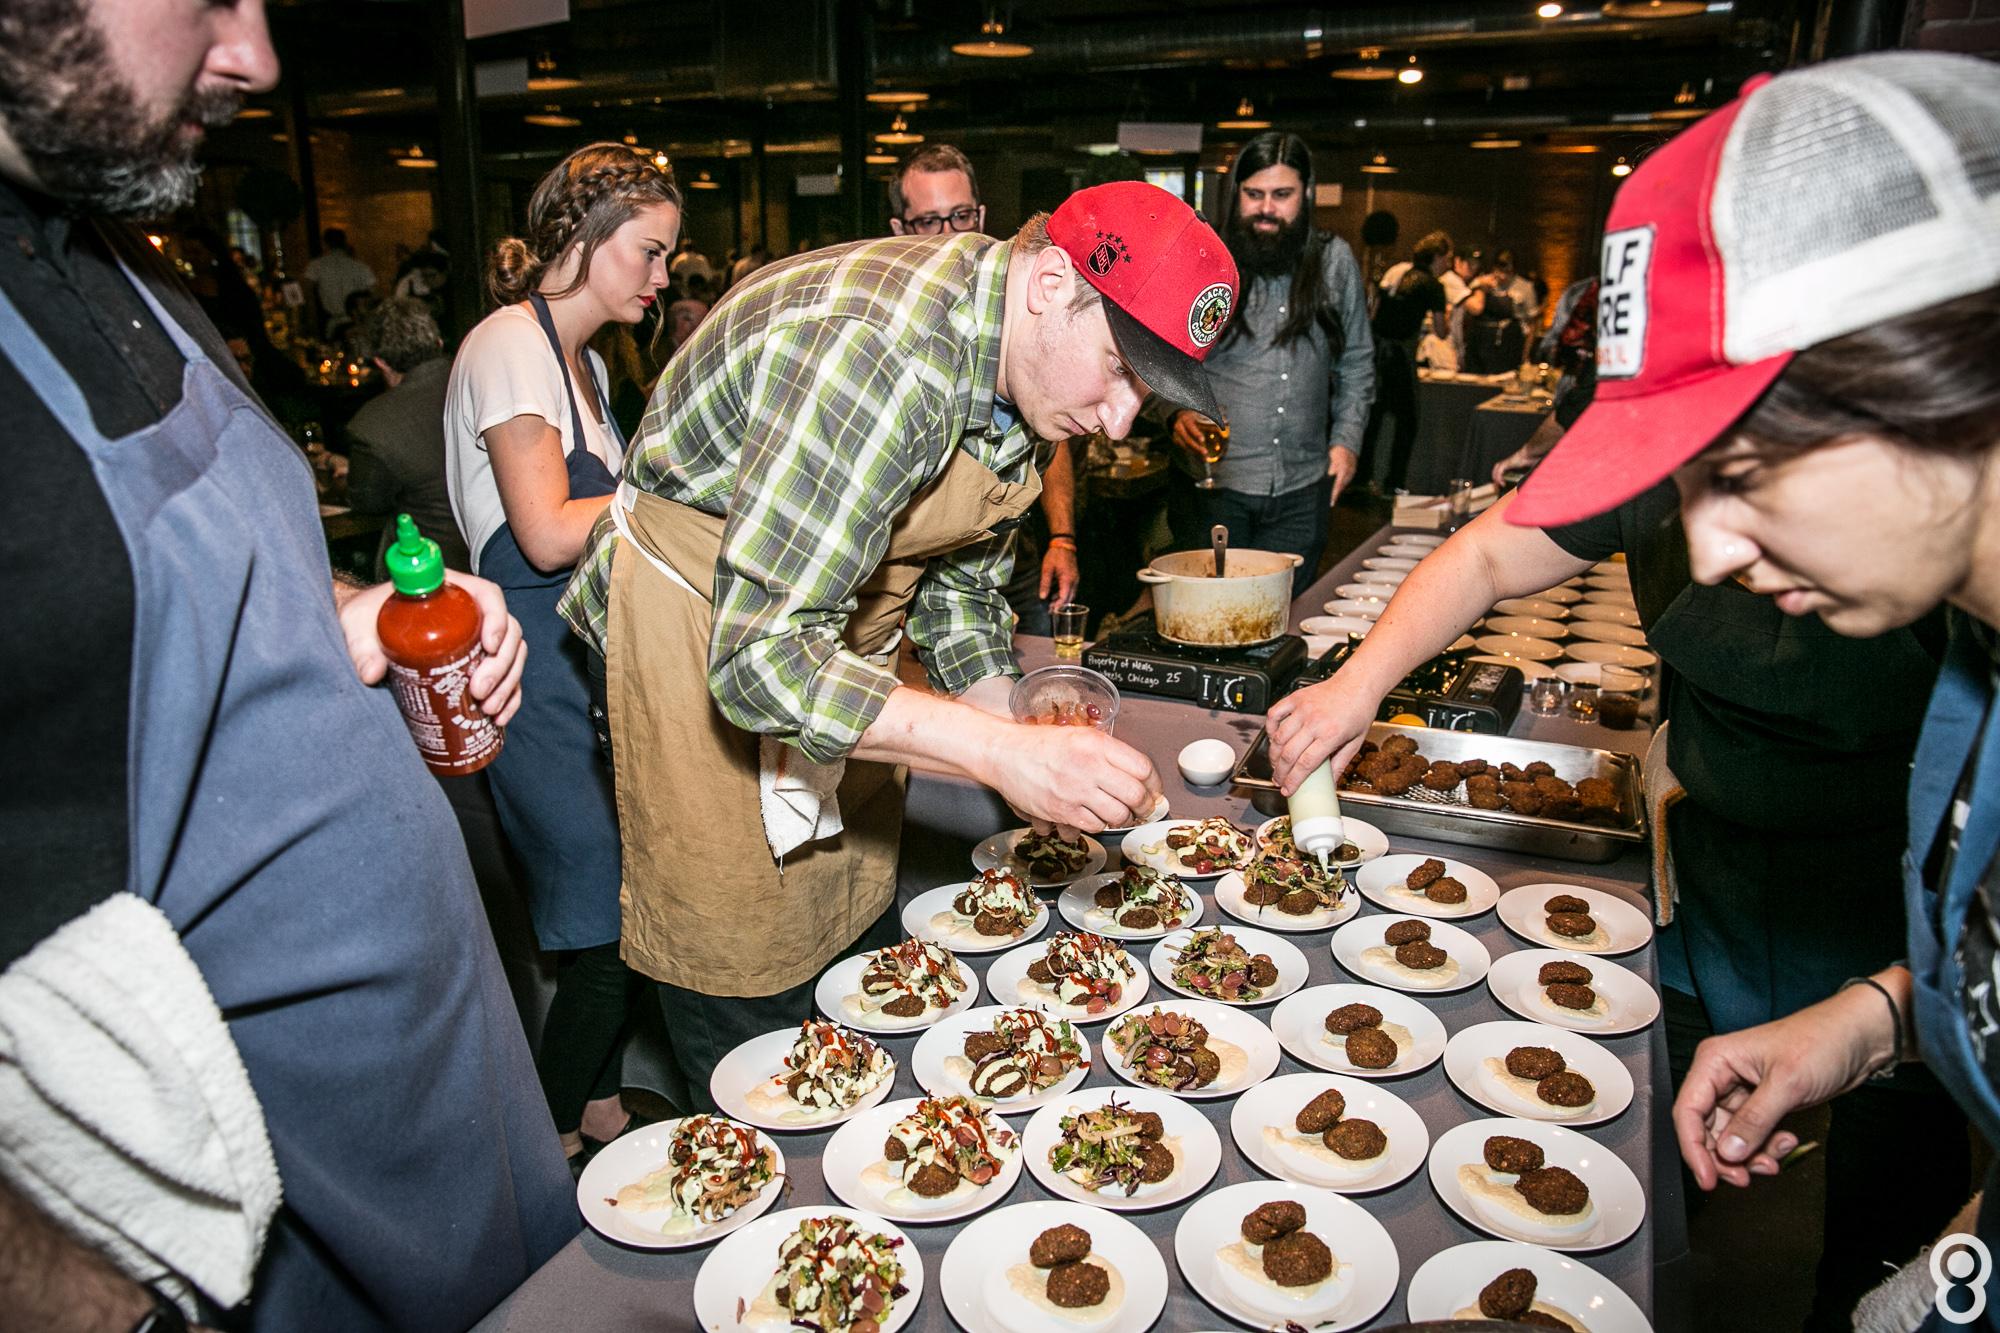 Meals on Wheels Celebrity Ball 2015/Photo: Huge Galdones